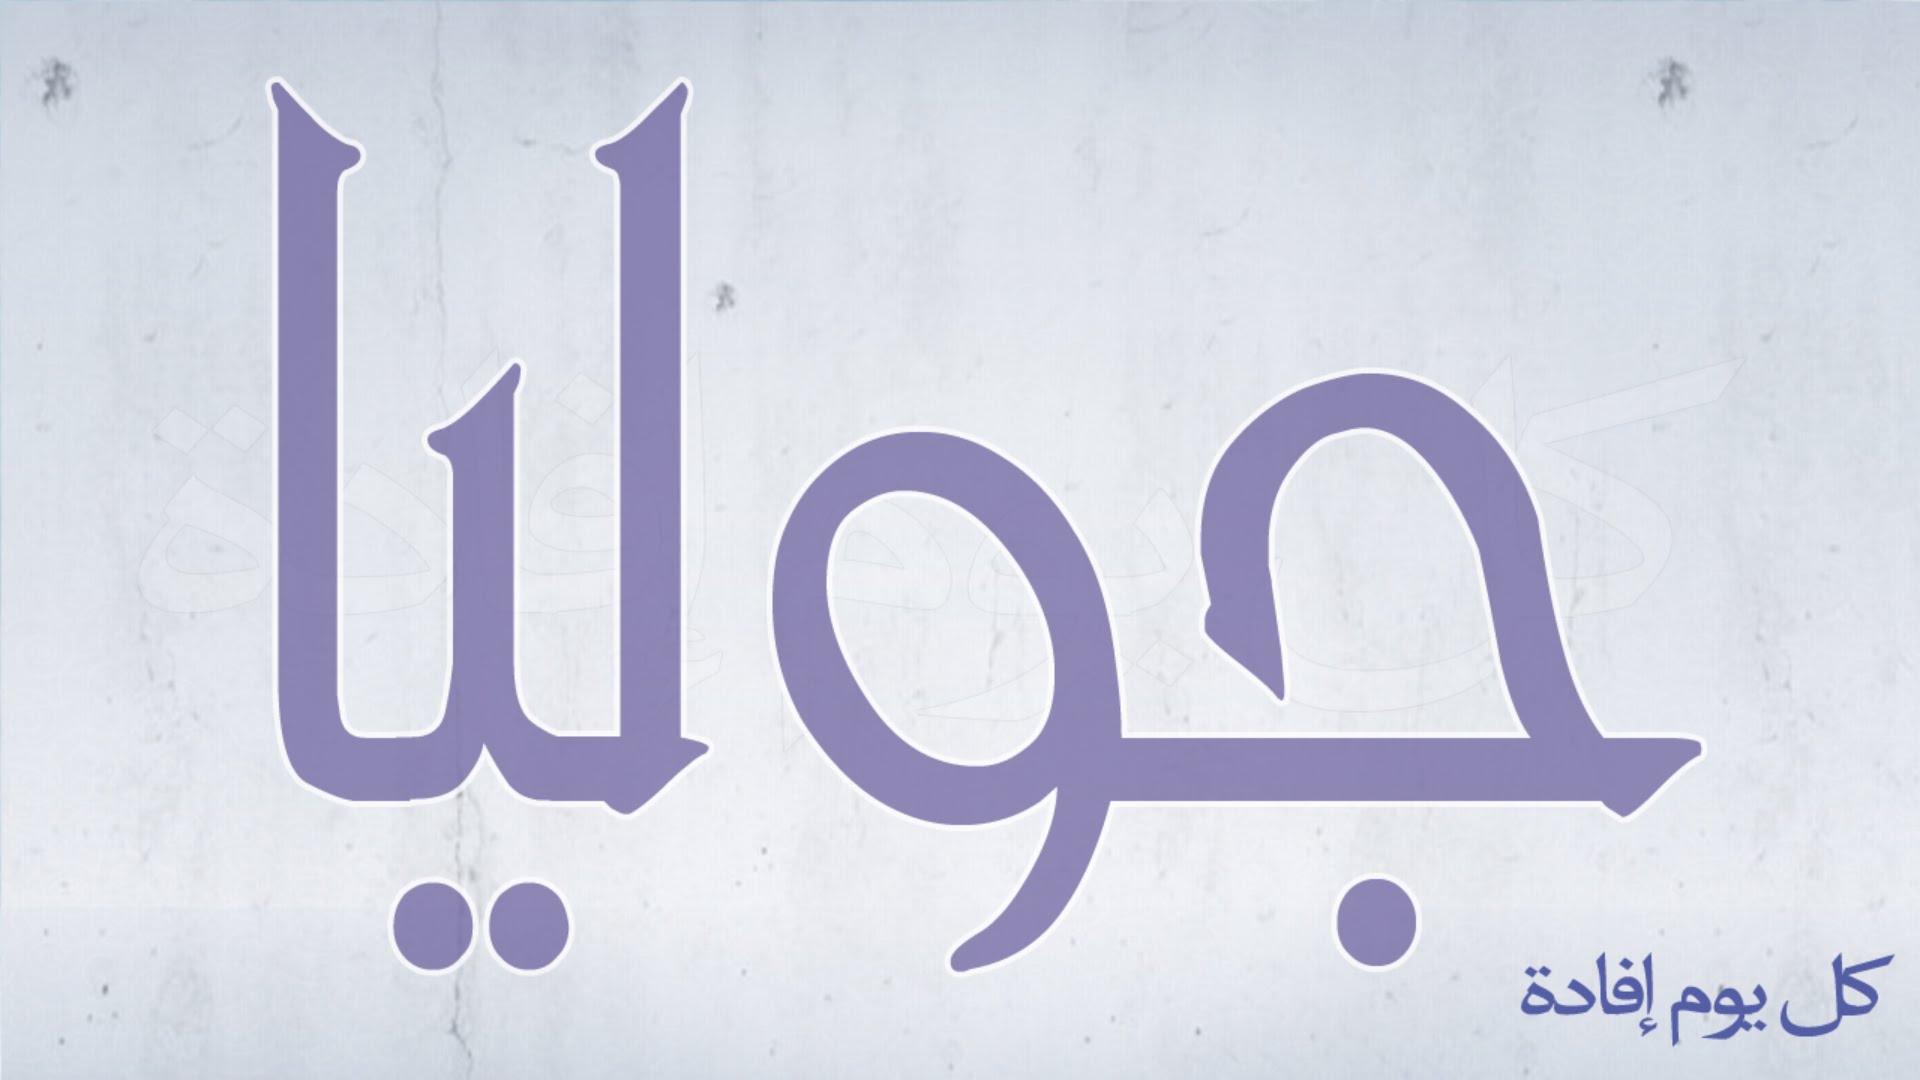 بالصور معنى اسم جوليا في الاسلام 5bab96eadef58e361c96402a43be4417